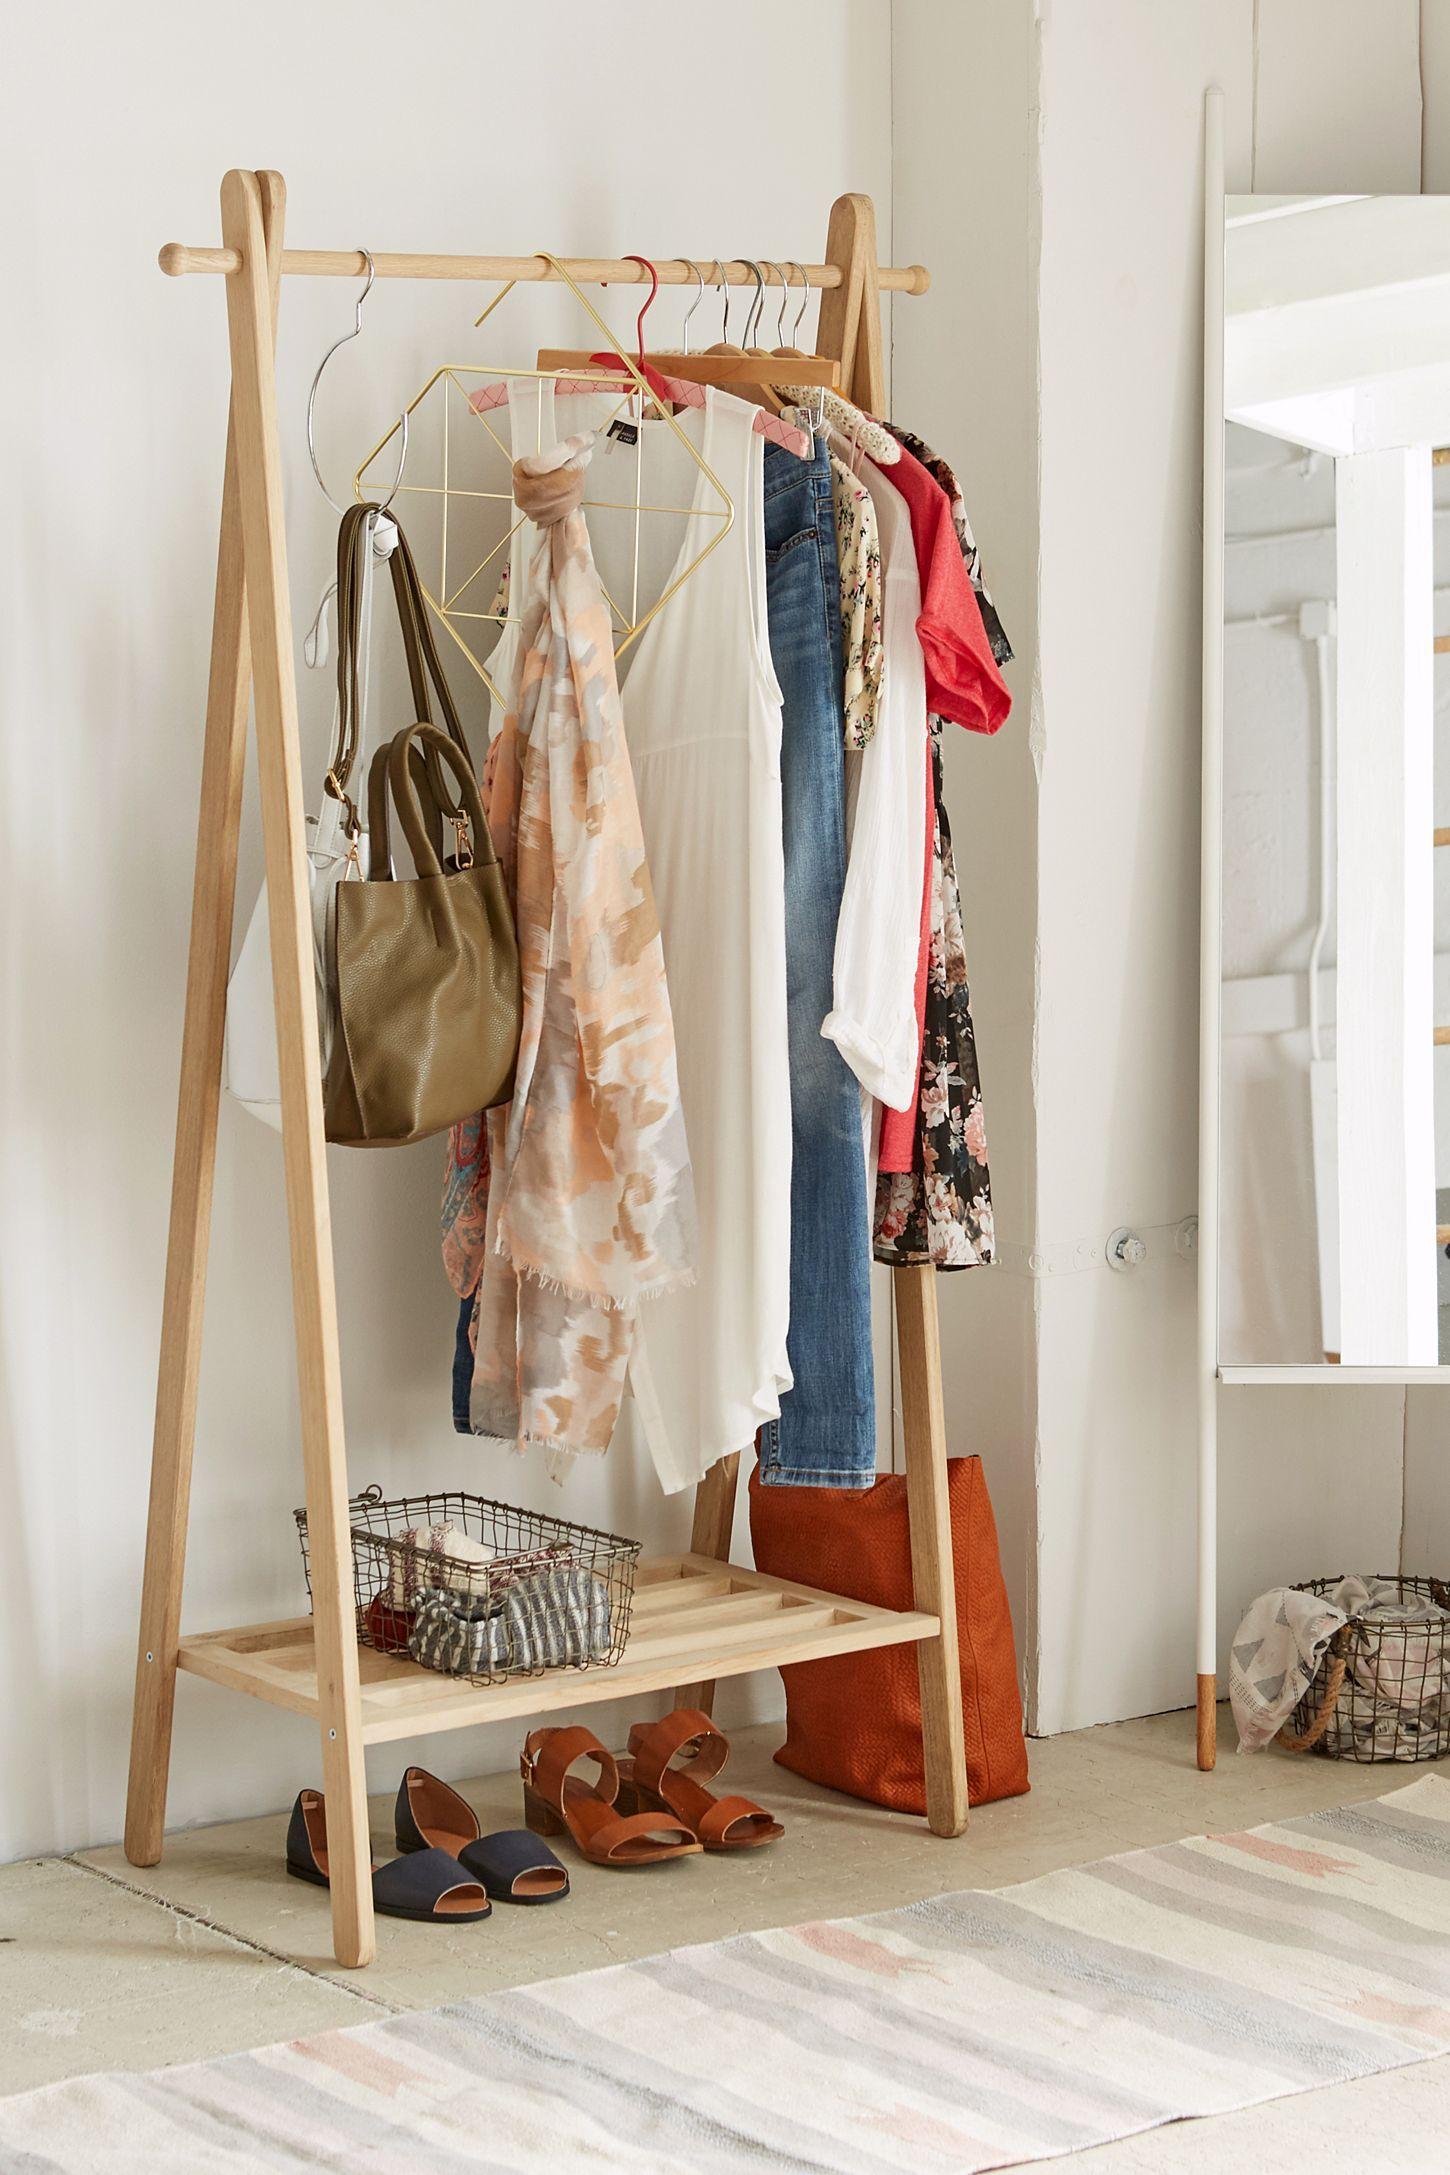 a3b6fab5154e Wooden Clothing Rack